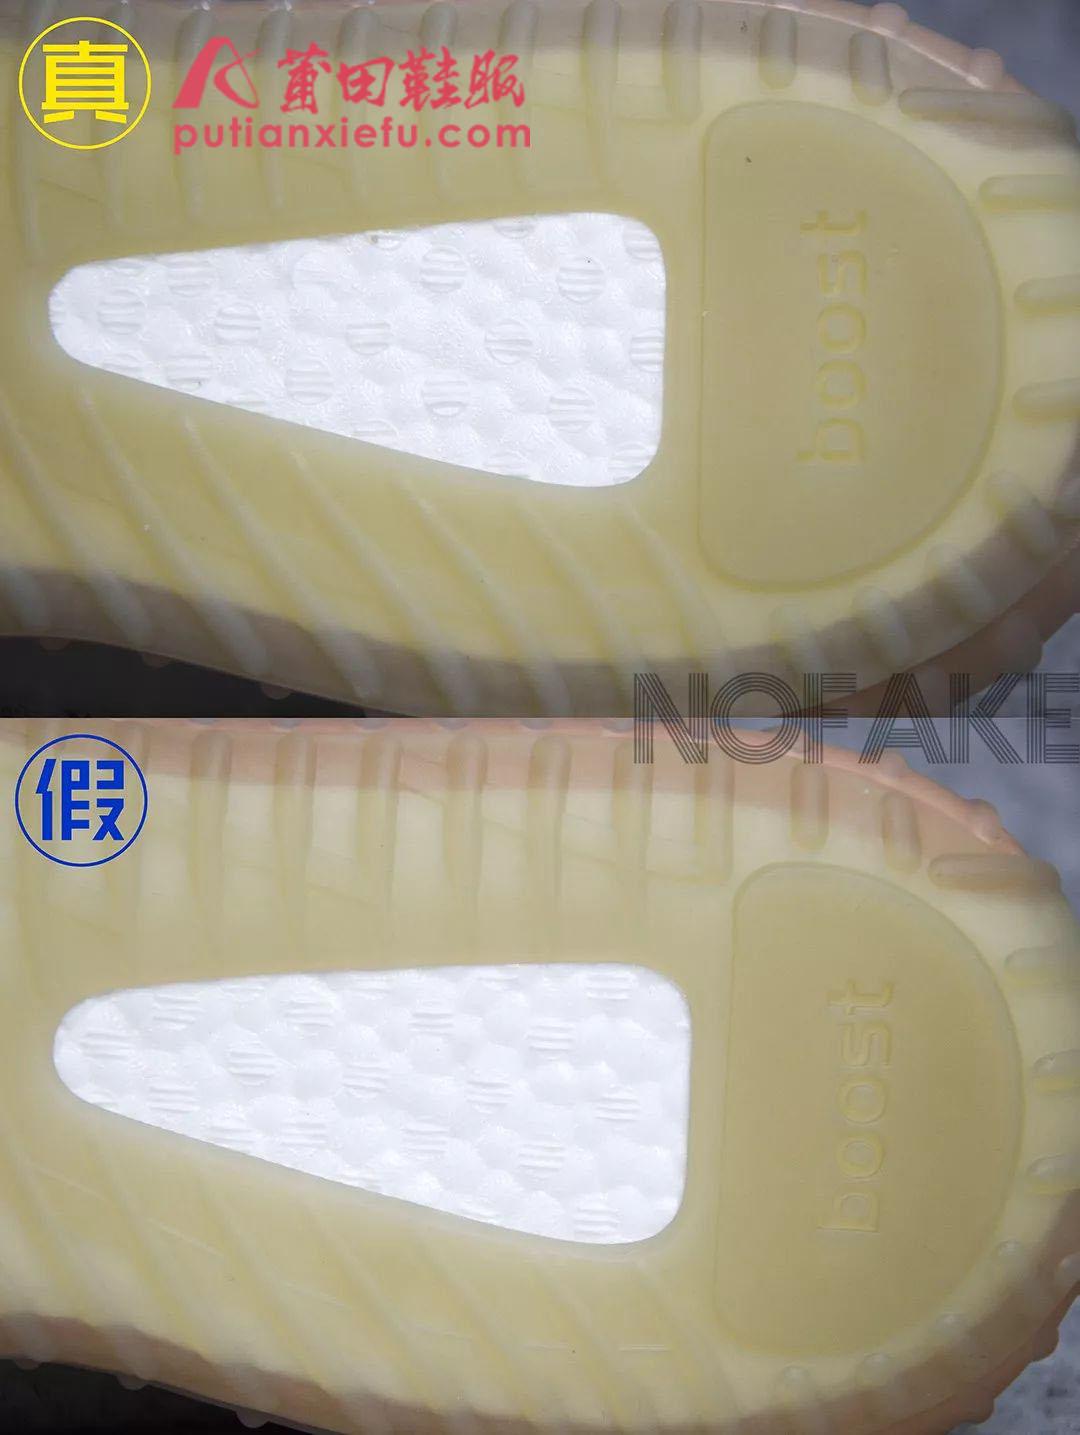 adidas Yeezy Boost 350 V2 灰橙3.0 欧洲限定 真假对比